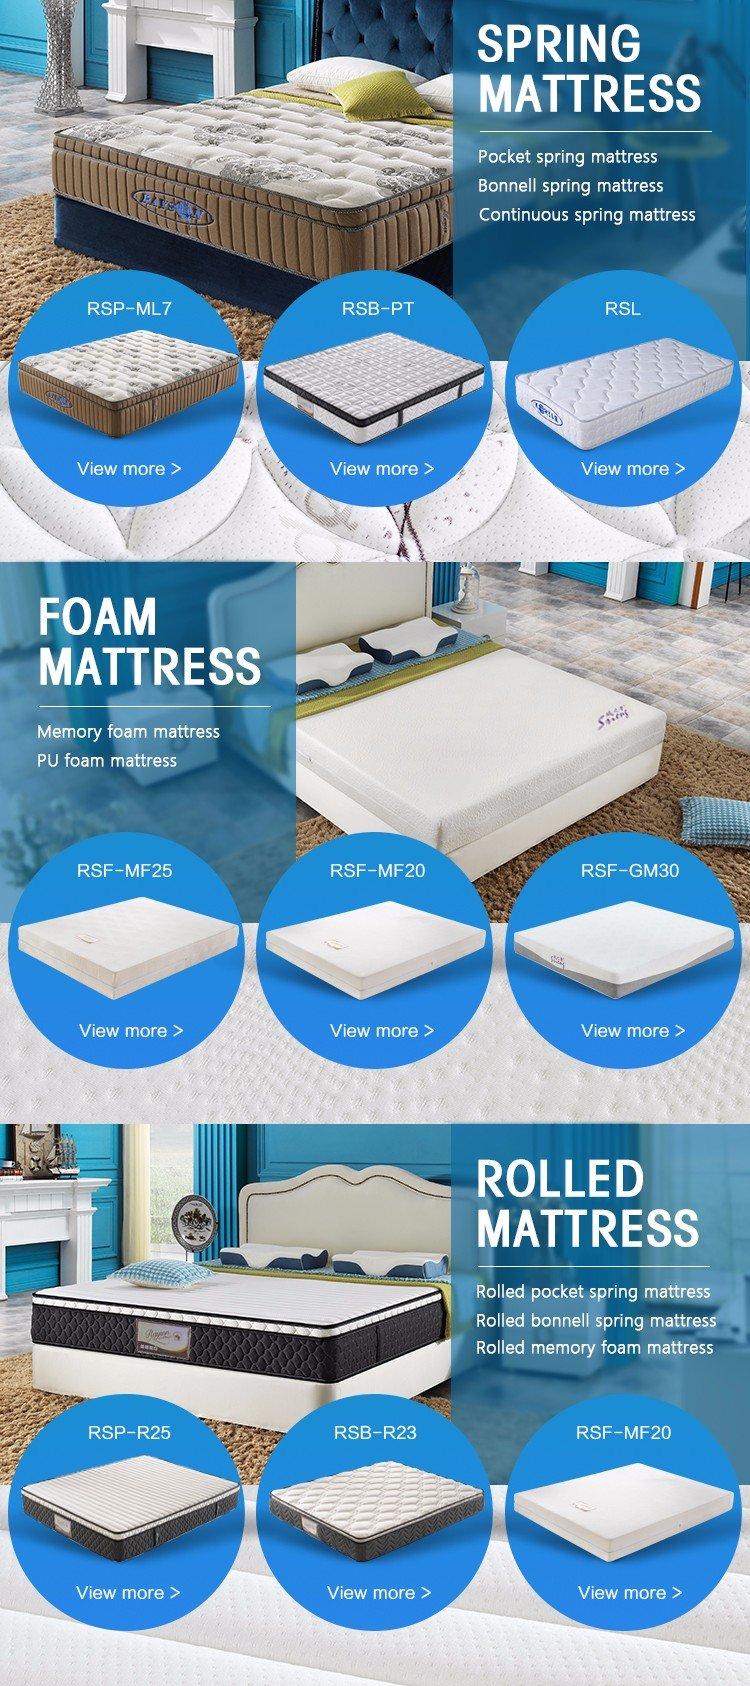 Rayson Mattress home sleepwell mattress manufacturers-9